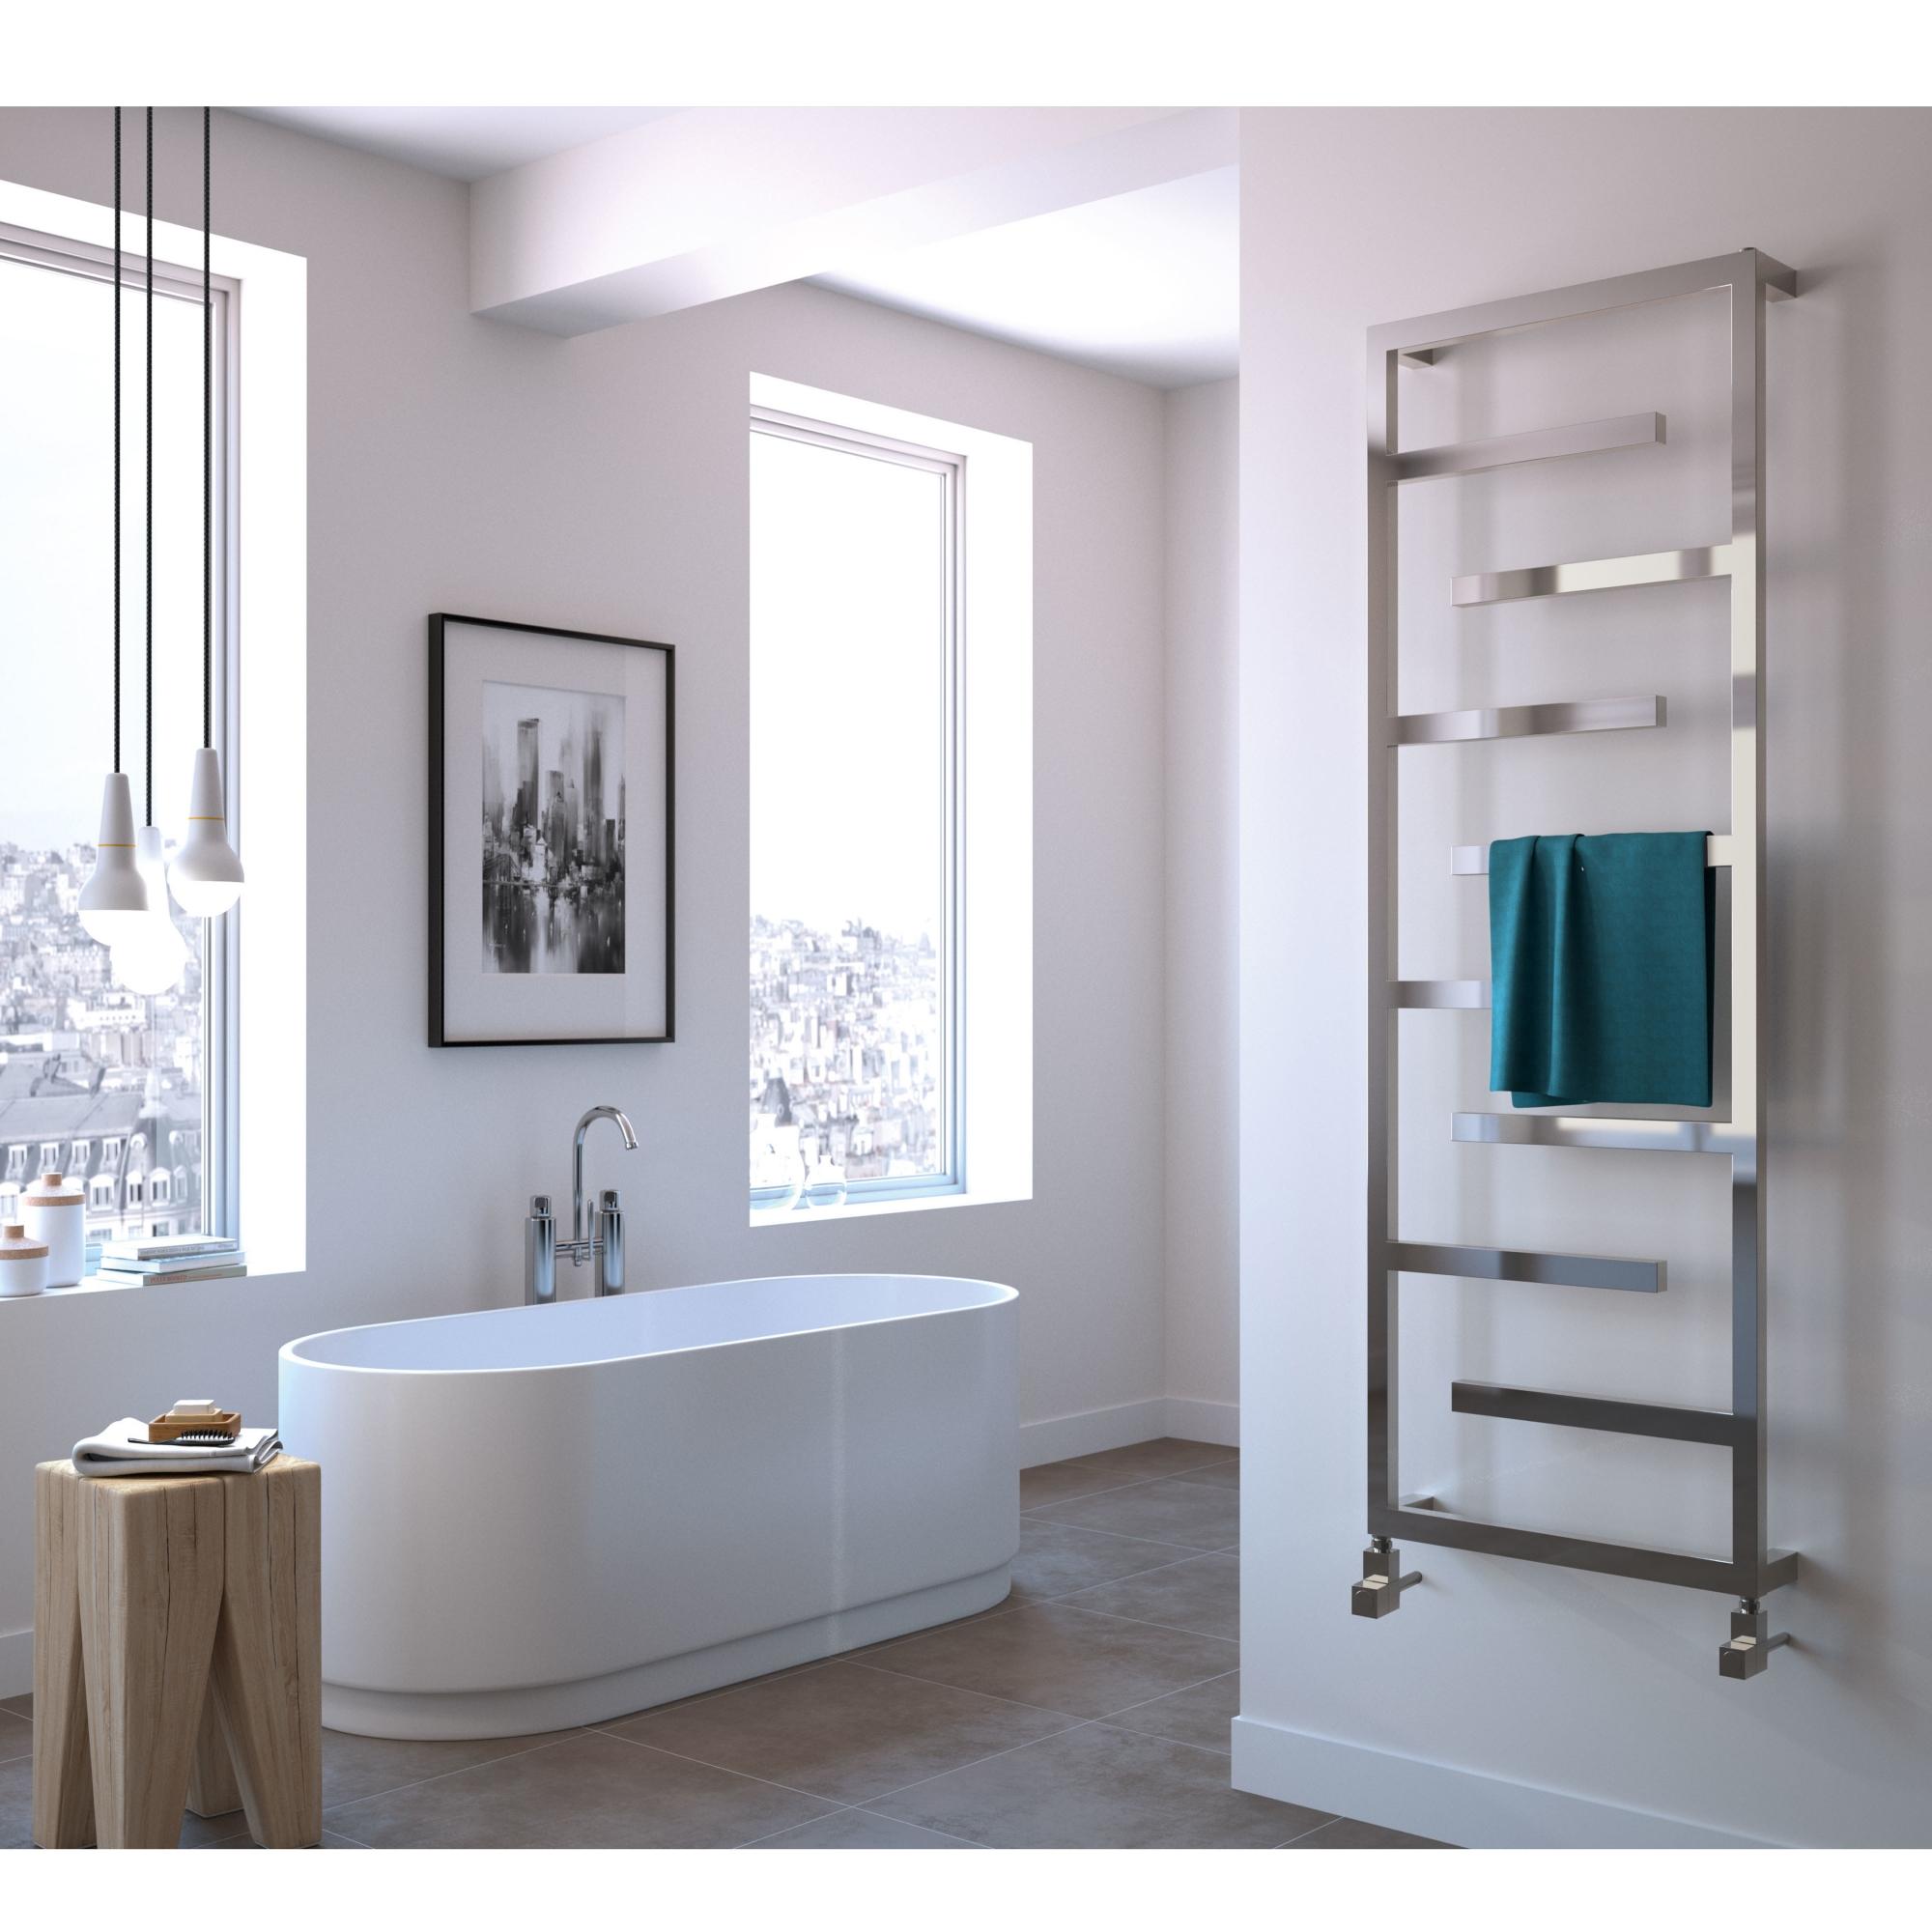 Radox Aztec Designer Heated Towel Rail 1265mm H x 600mm W Chrome-0